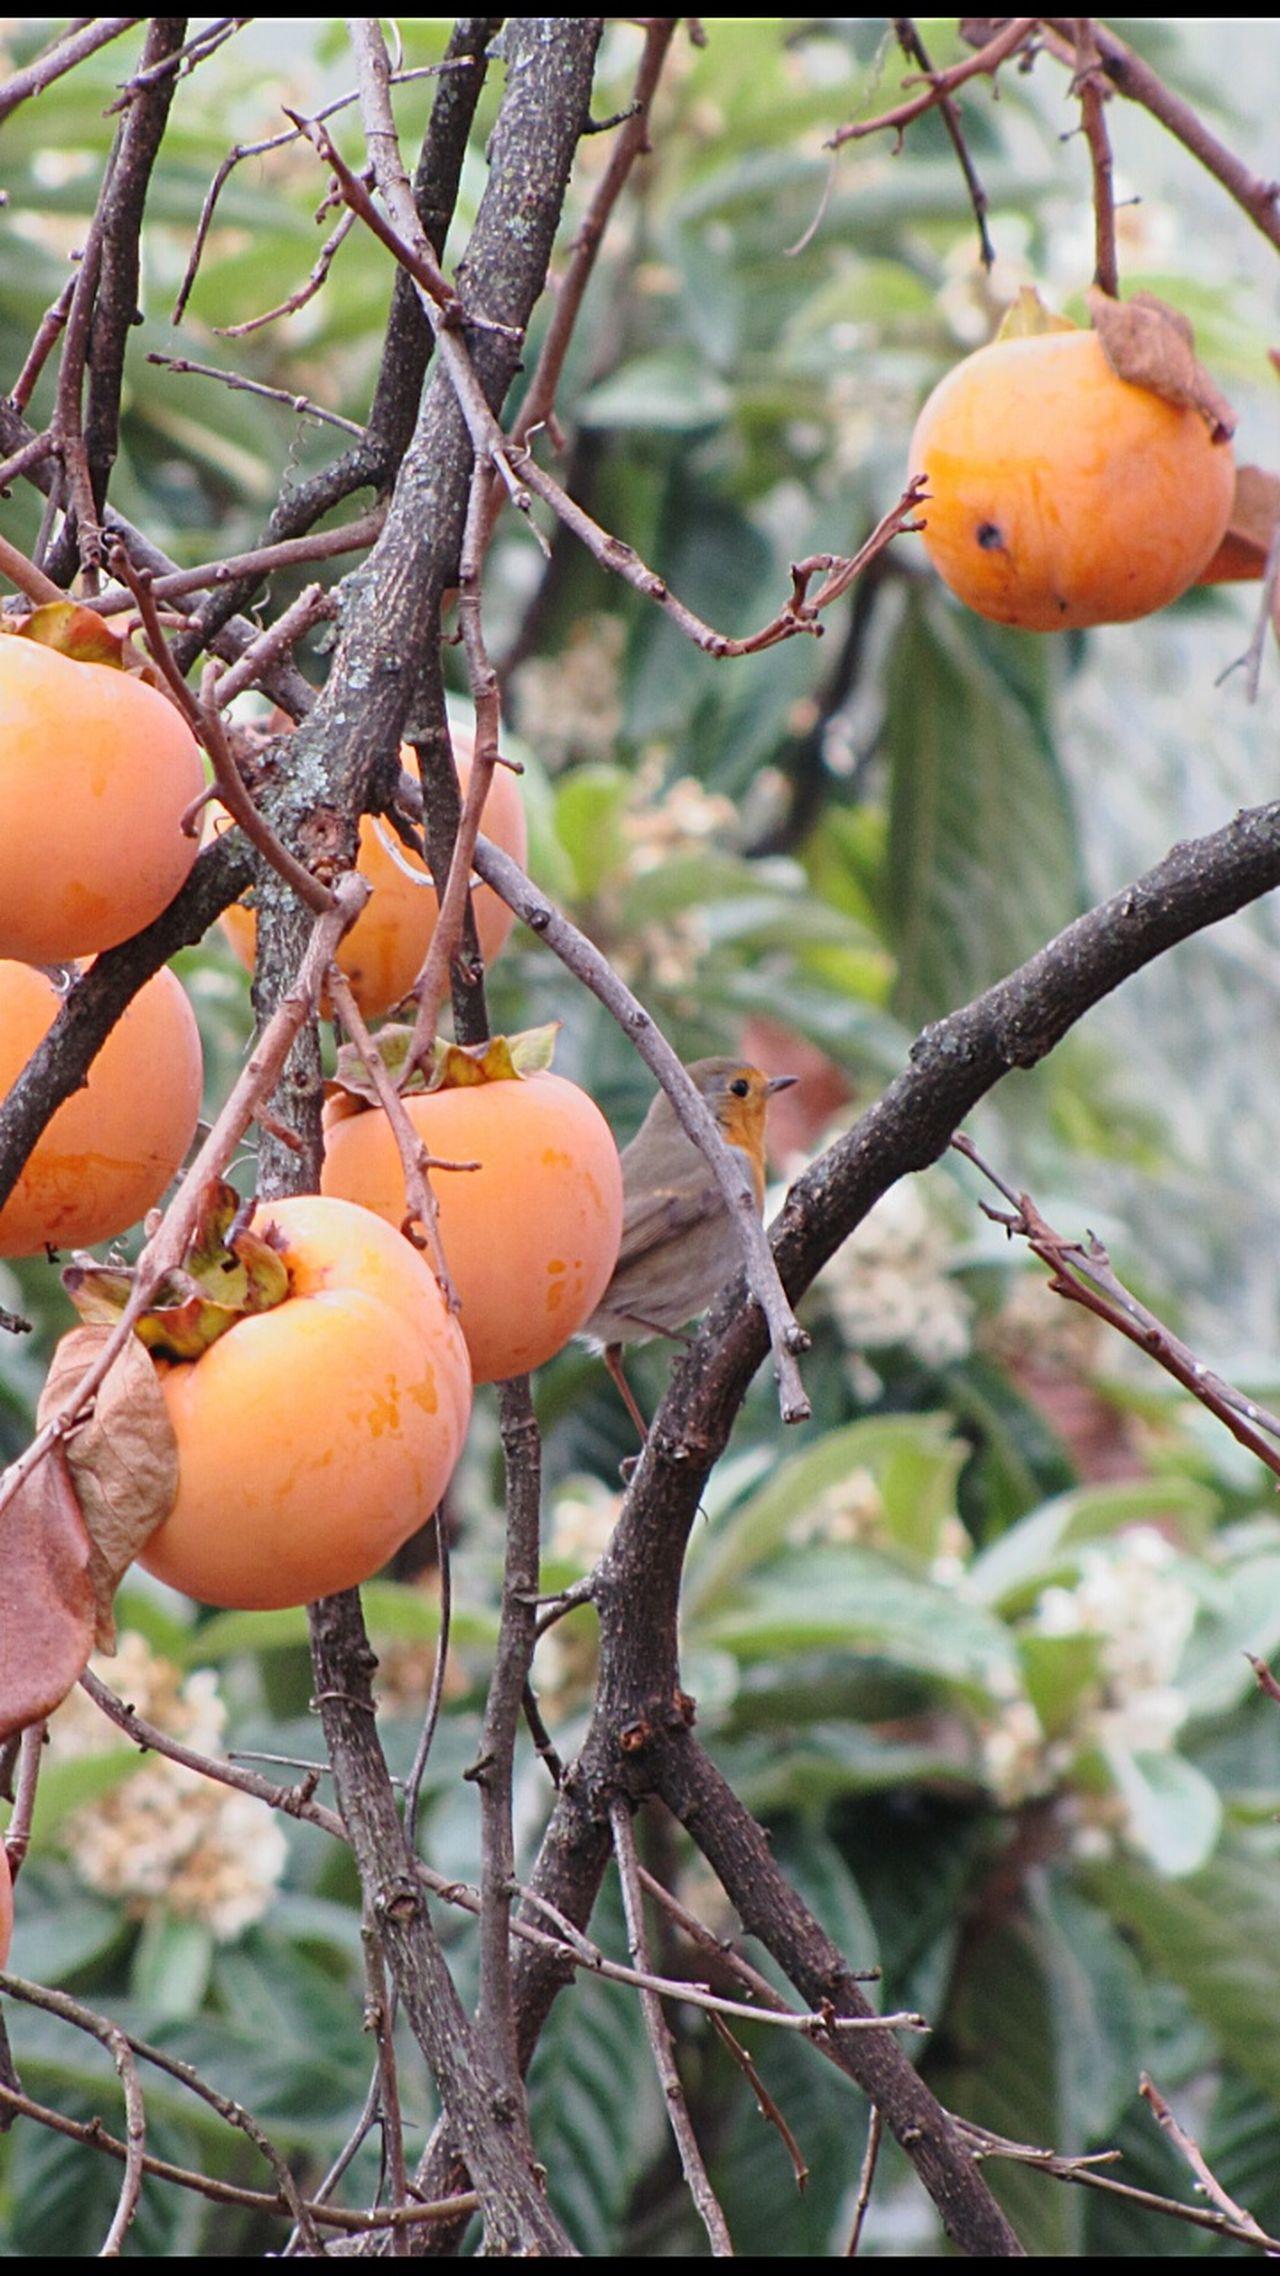 Redbird Bird Bird Photography Nature Persimmon Persimmon Tree Autumn Branches Wildlife Animal Italy